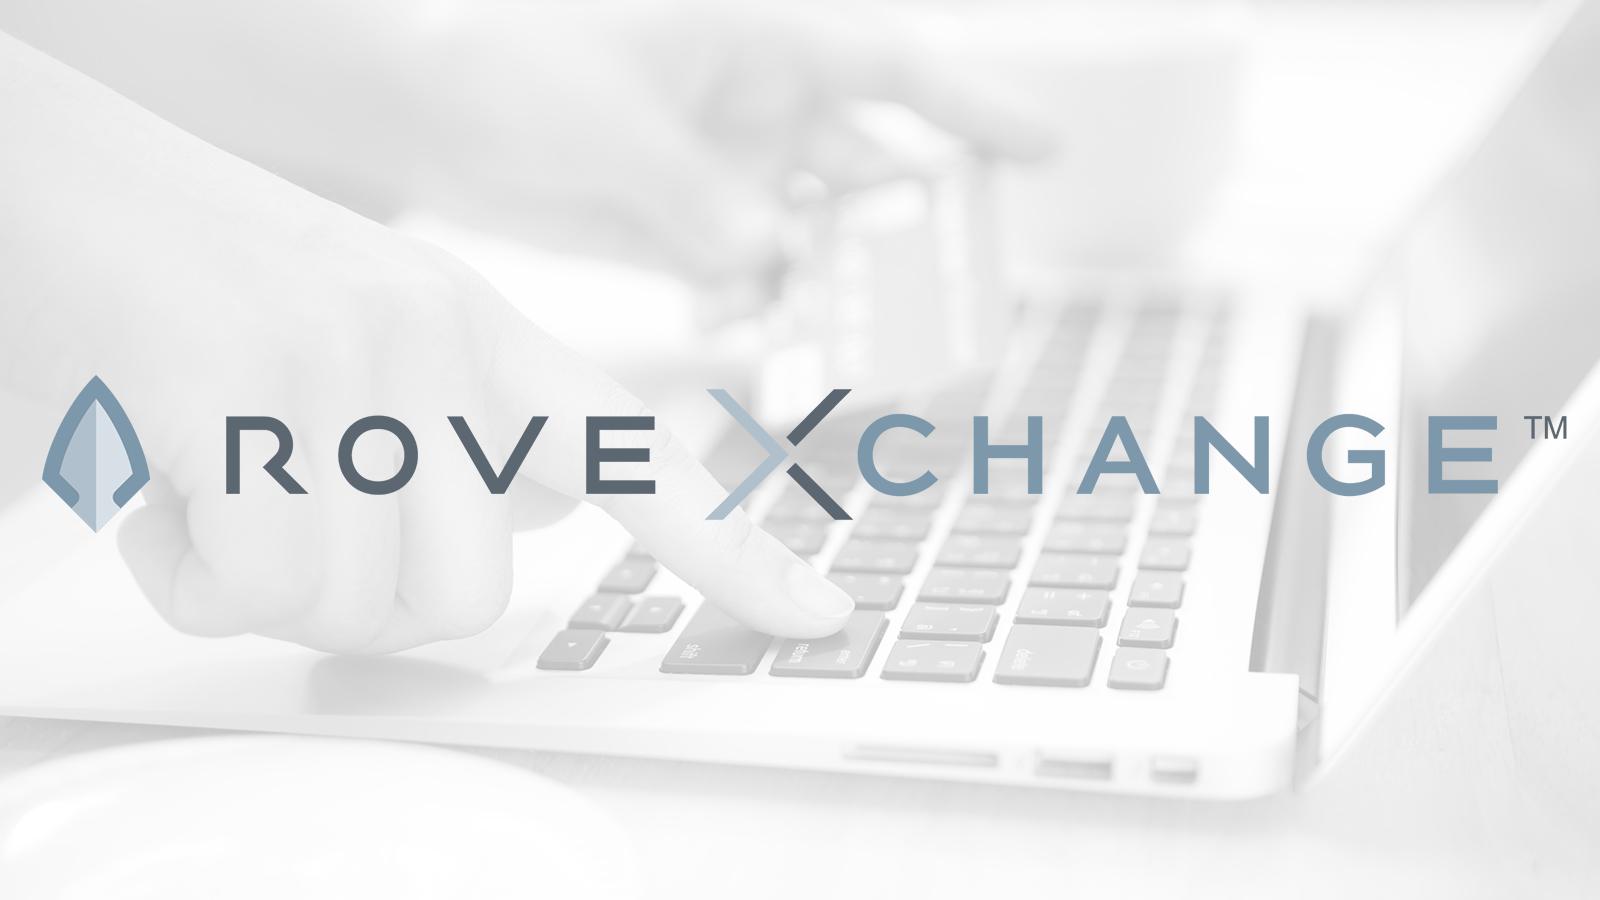 ROVE Xchange.jpg